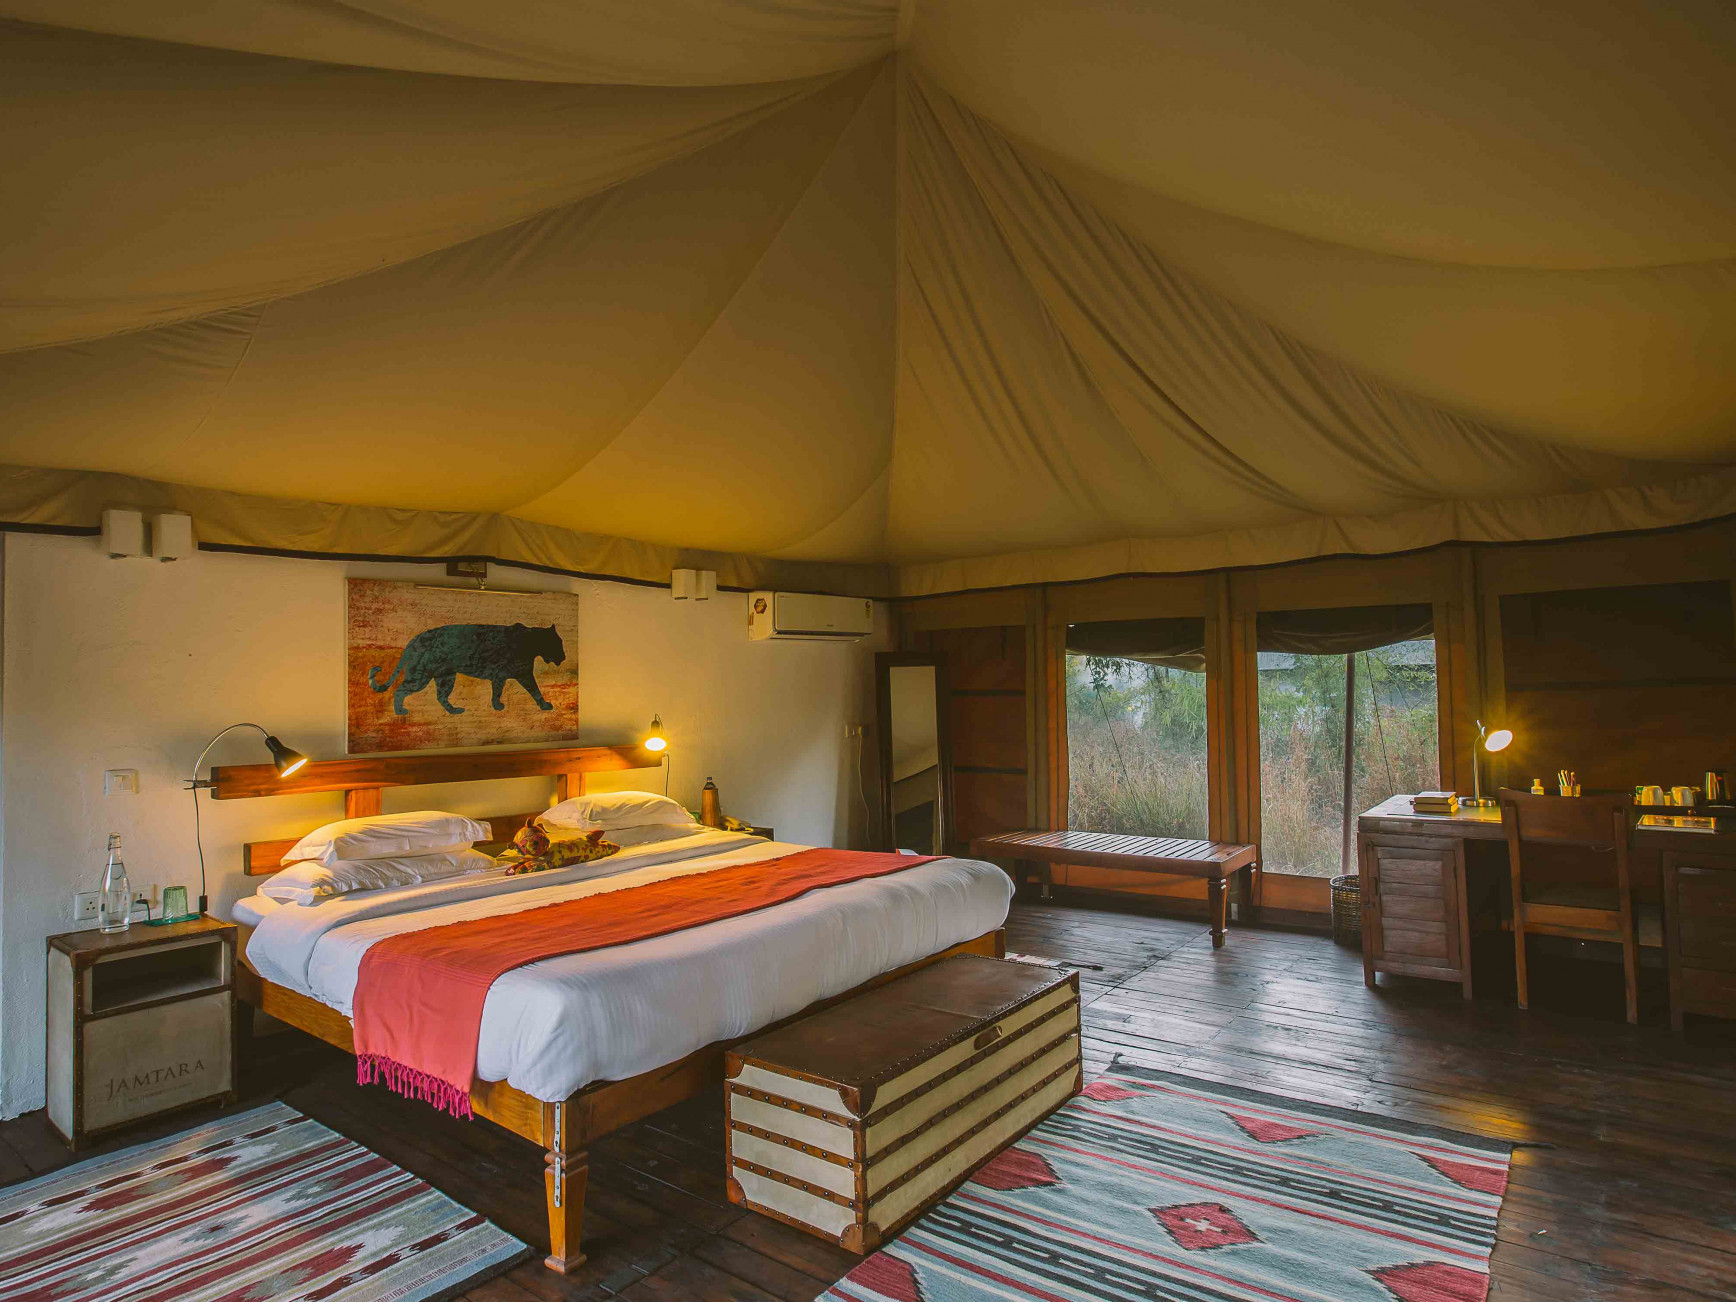 Jamtara Wilderness Camp, Pench National Park, India